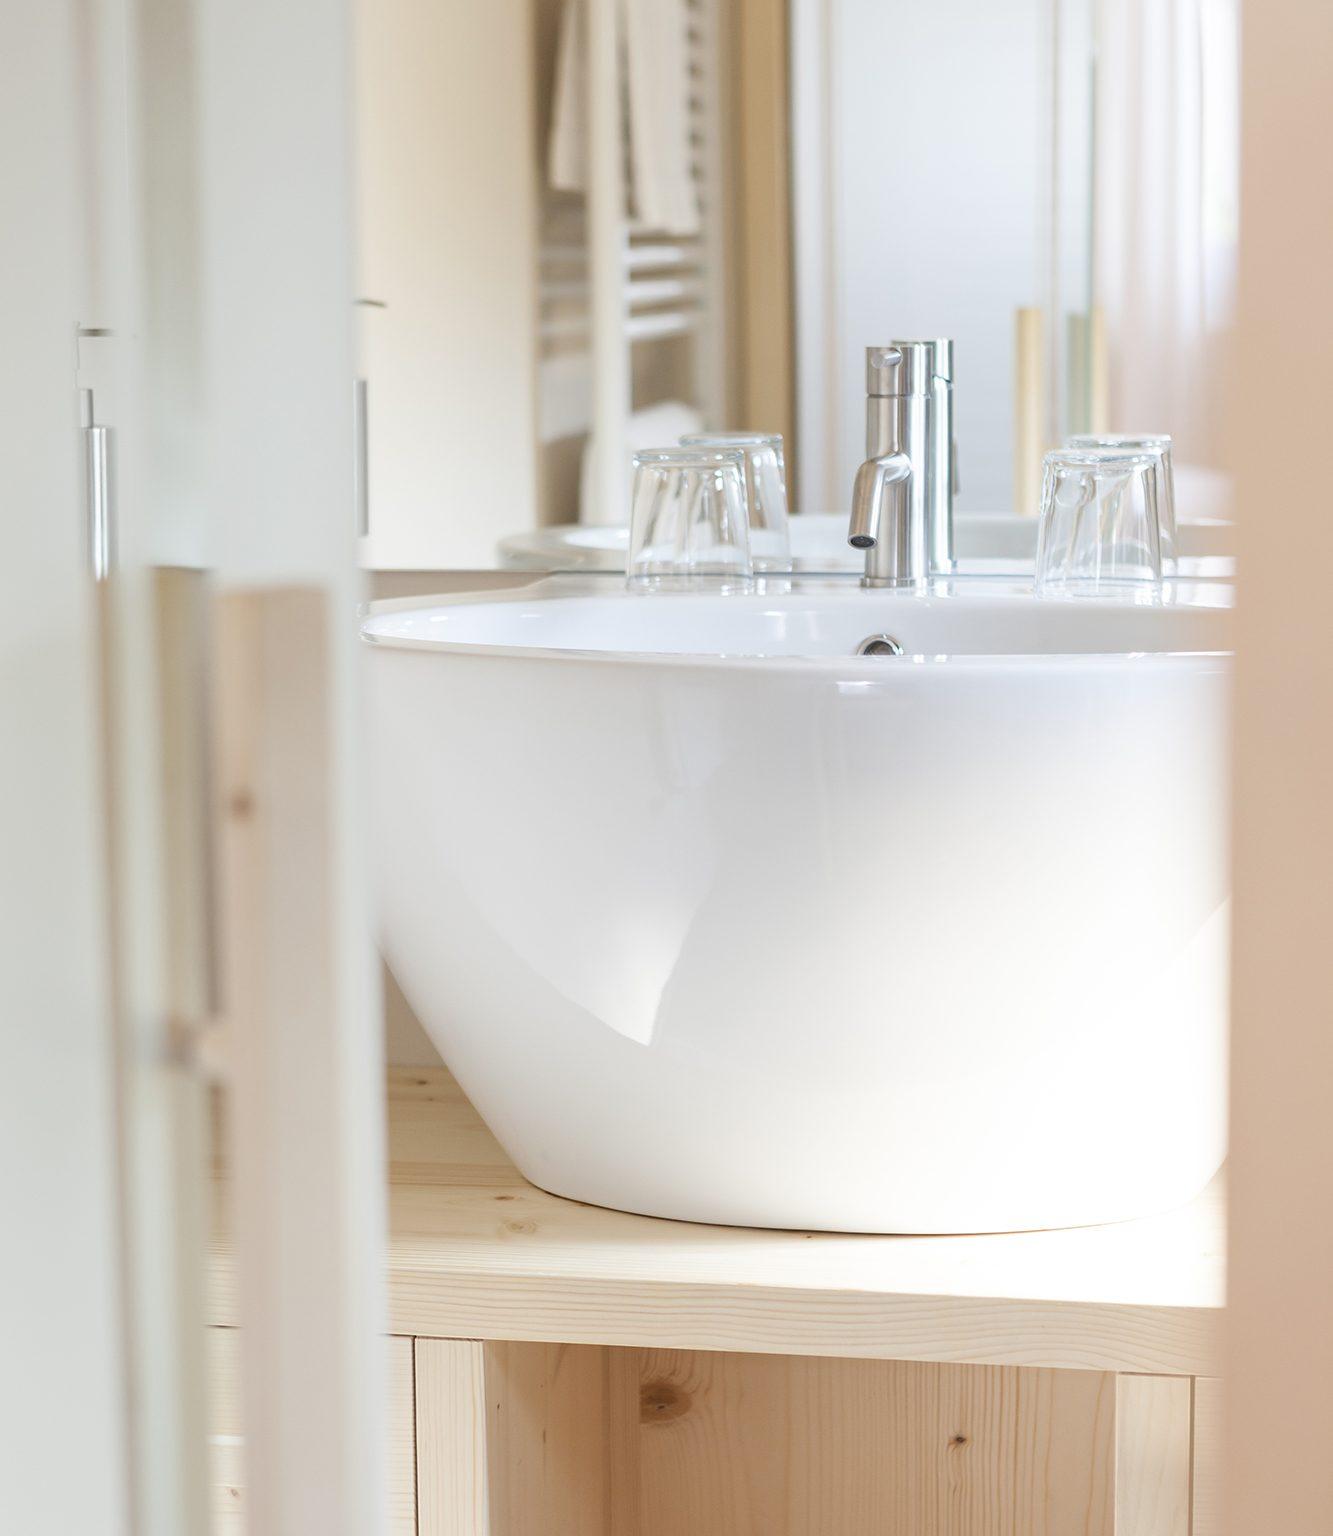 hotel-mayr bathroom wash basin